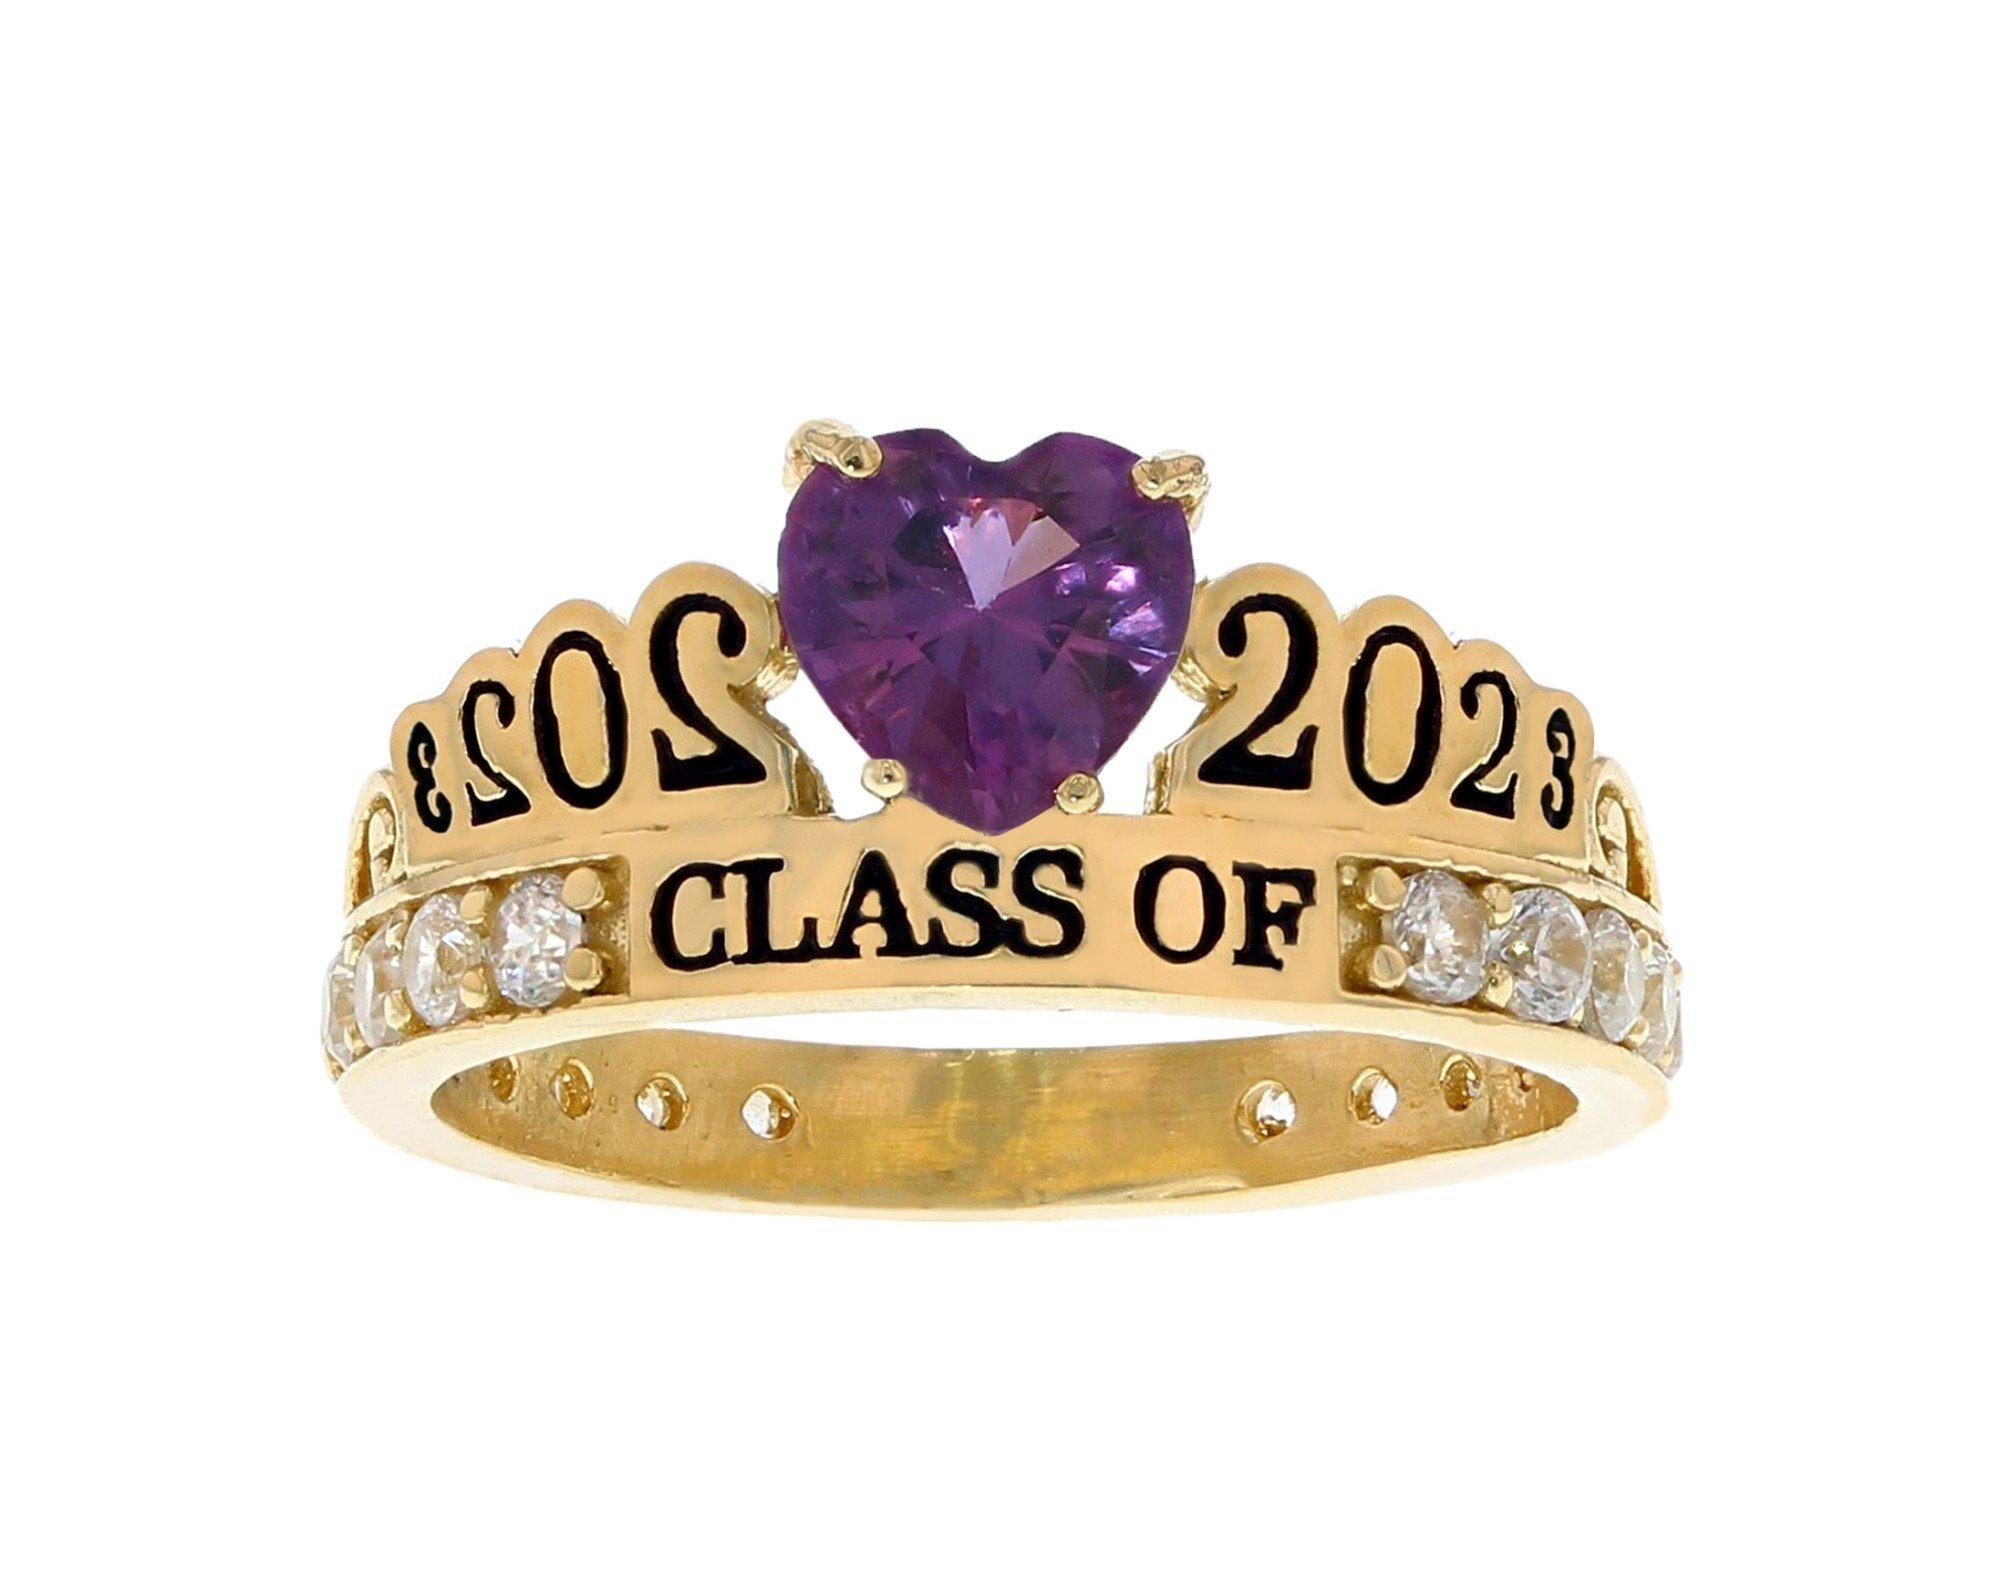 10k or 14k Gold Simulated Alexandrite June Birthstone 2020 Graduation Ring